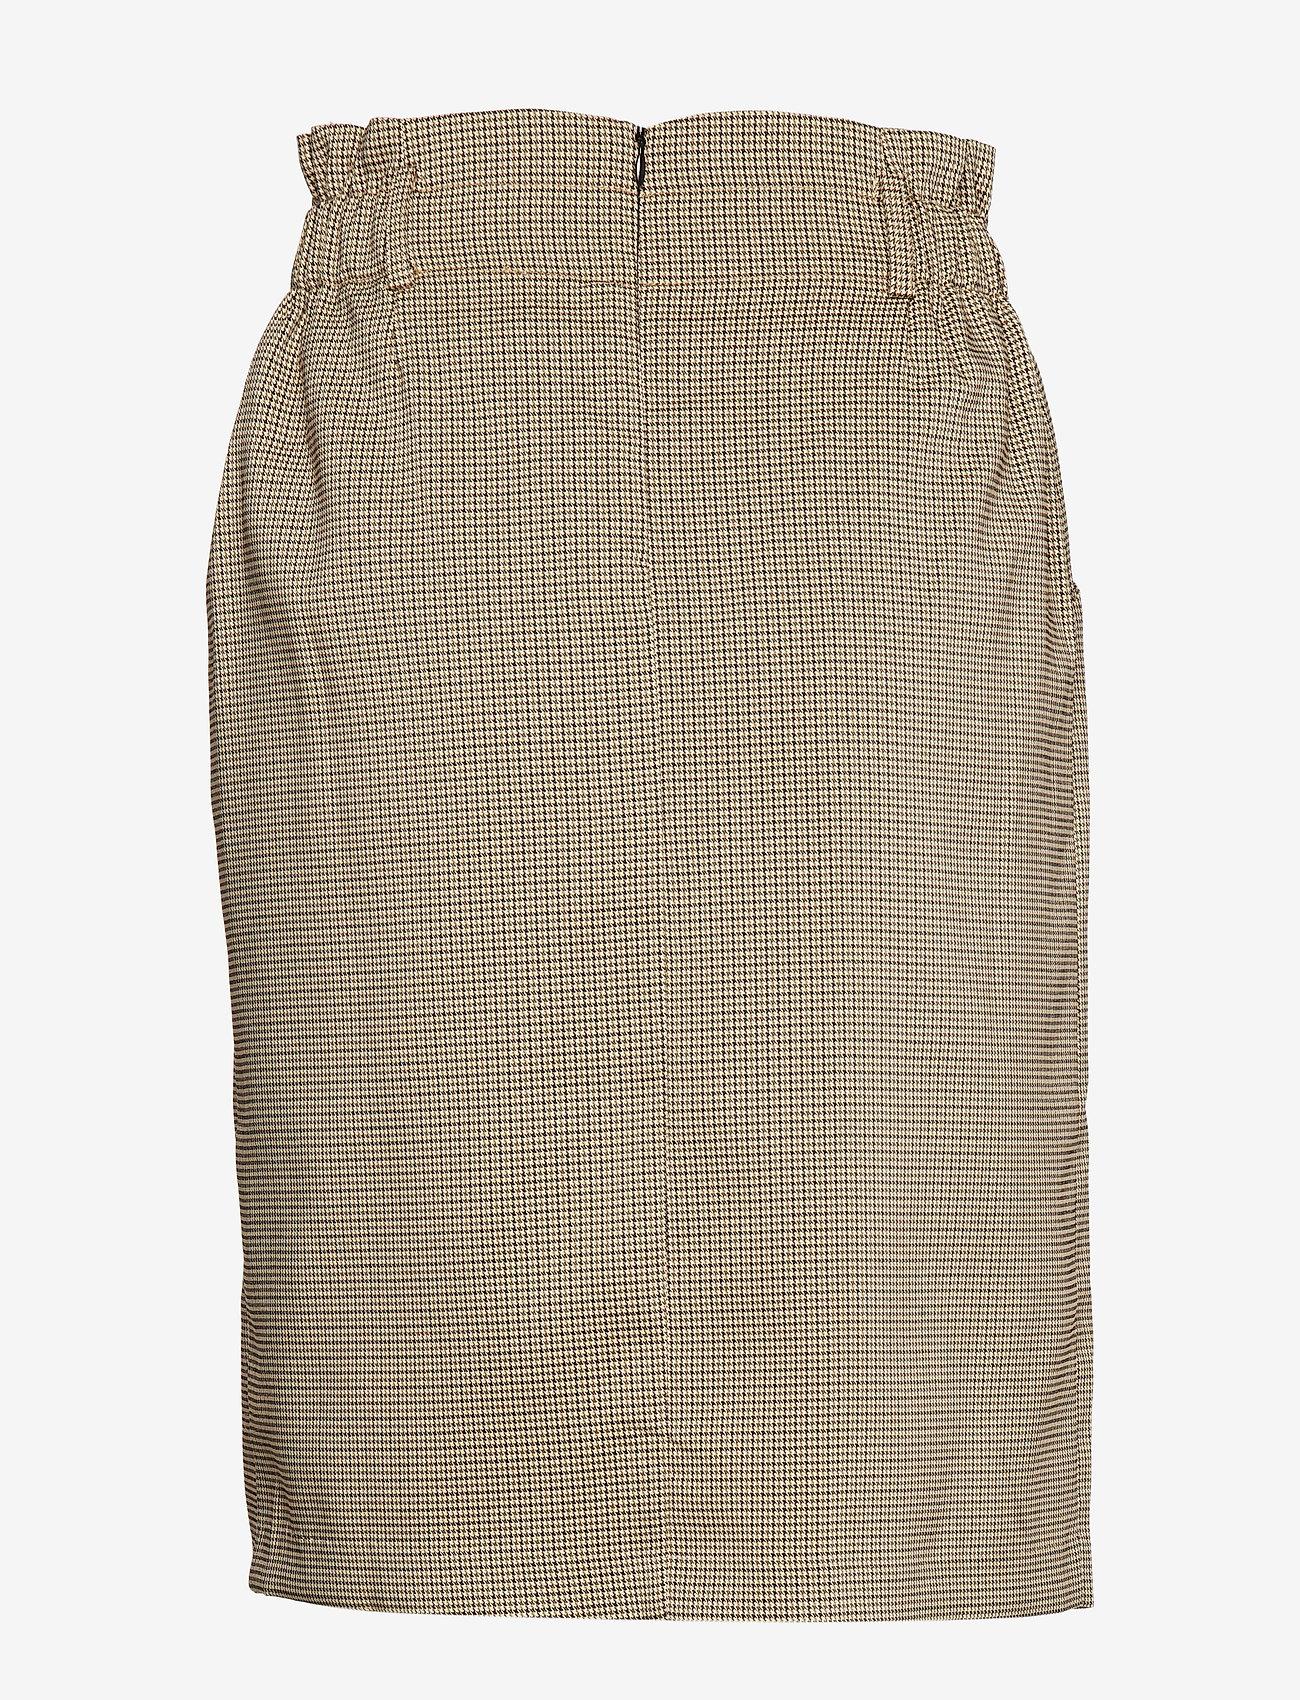 Minus - Lay skirt - midi skirts - houndstooth check - 1